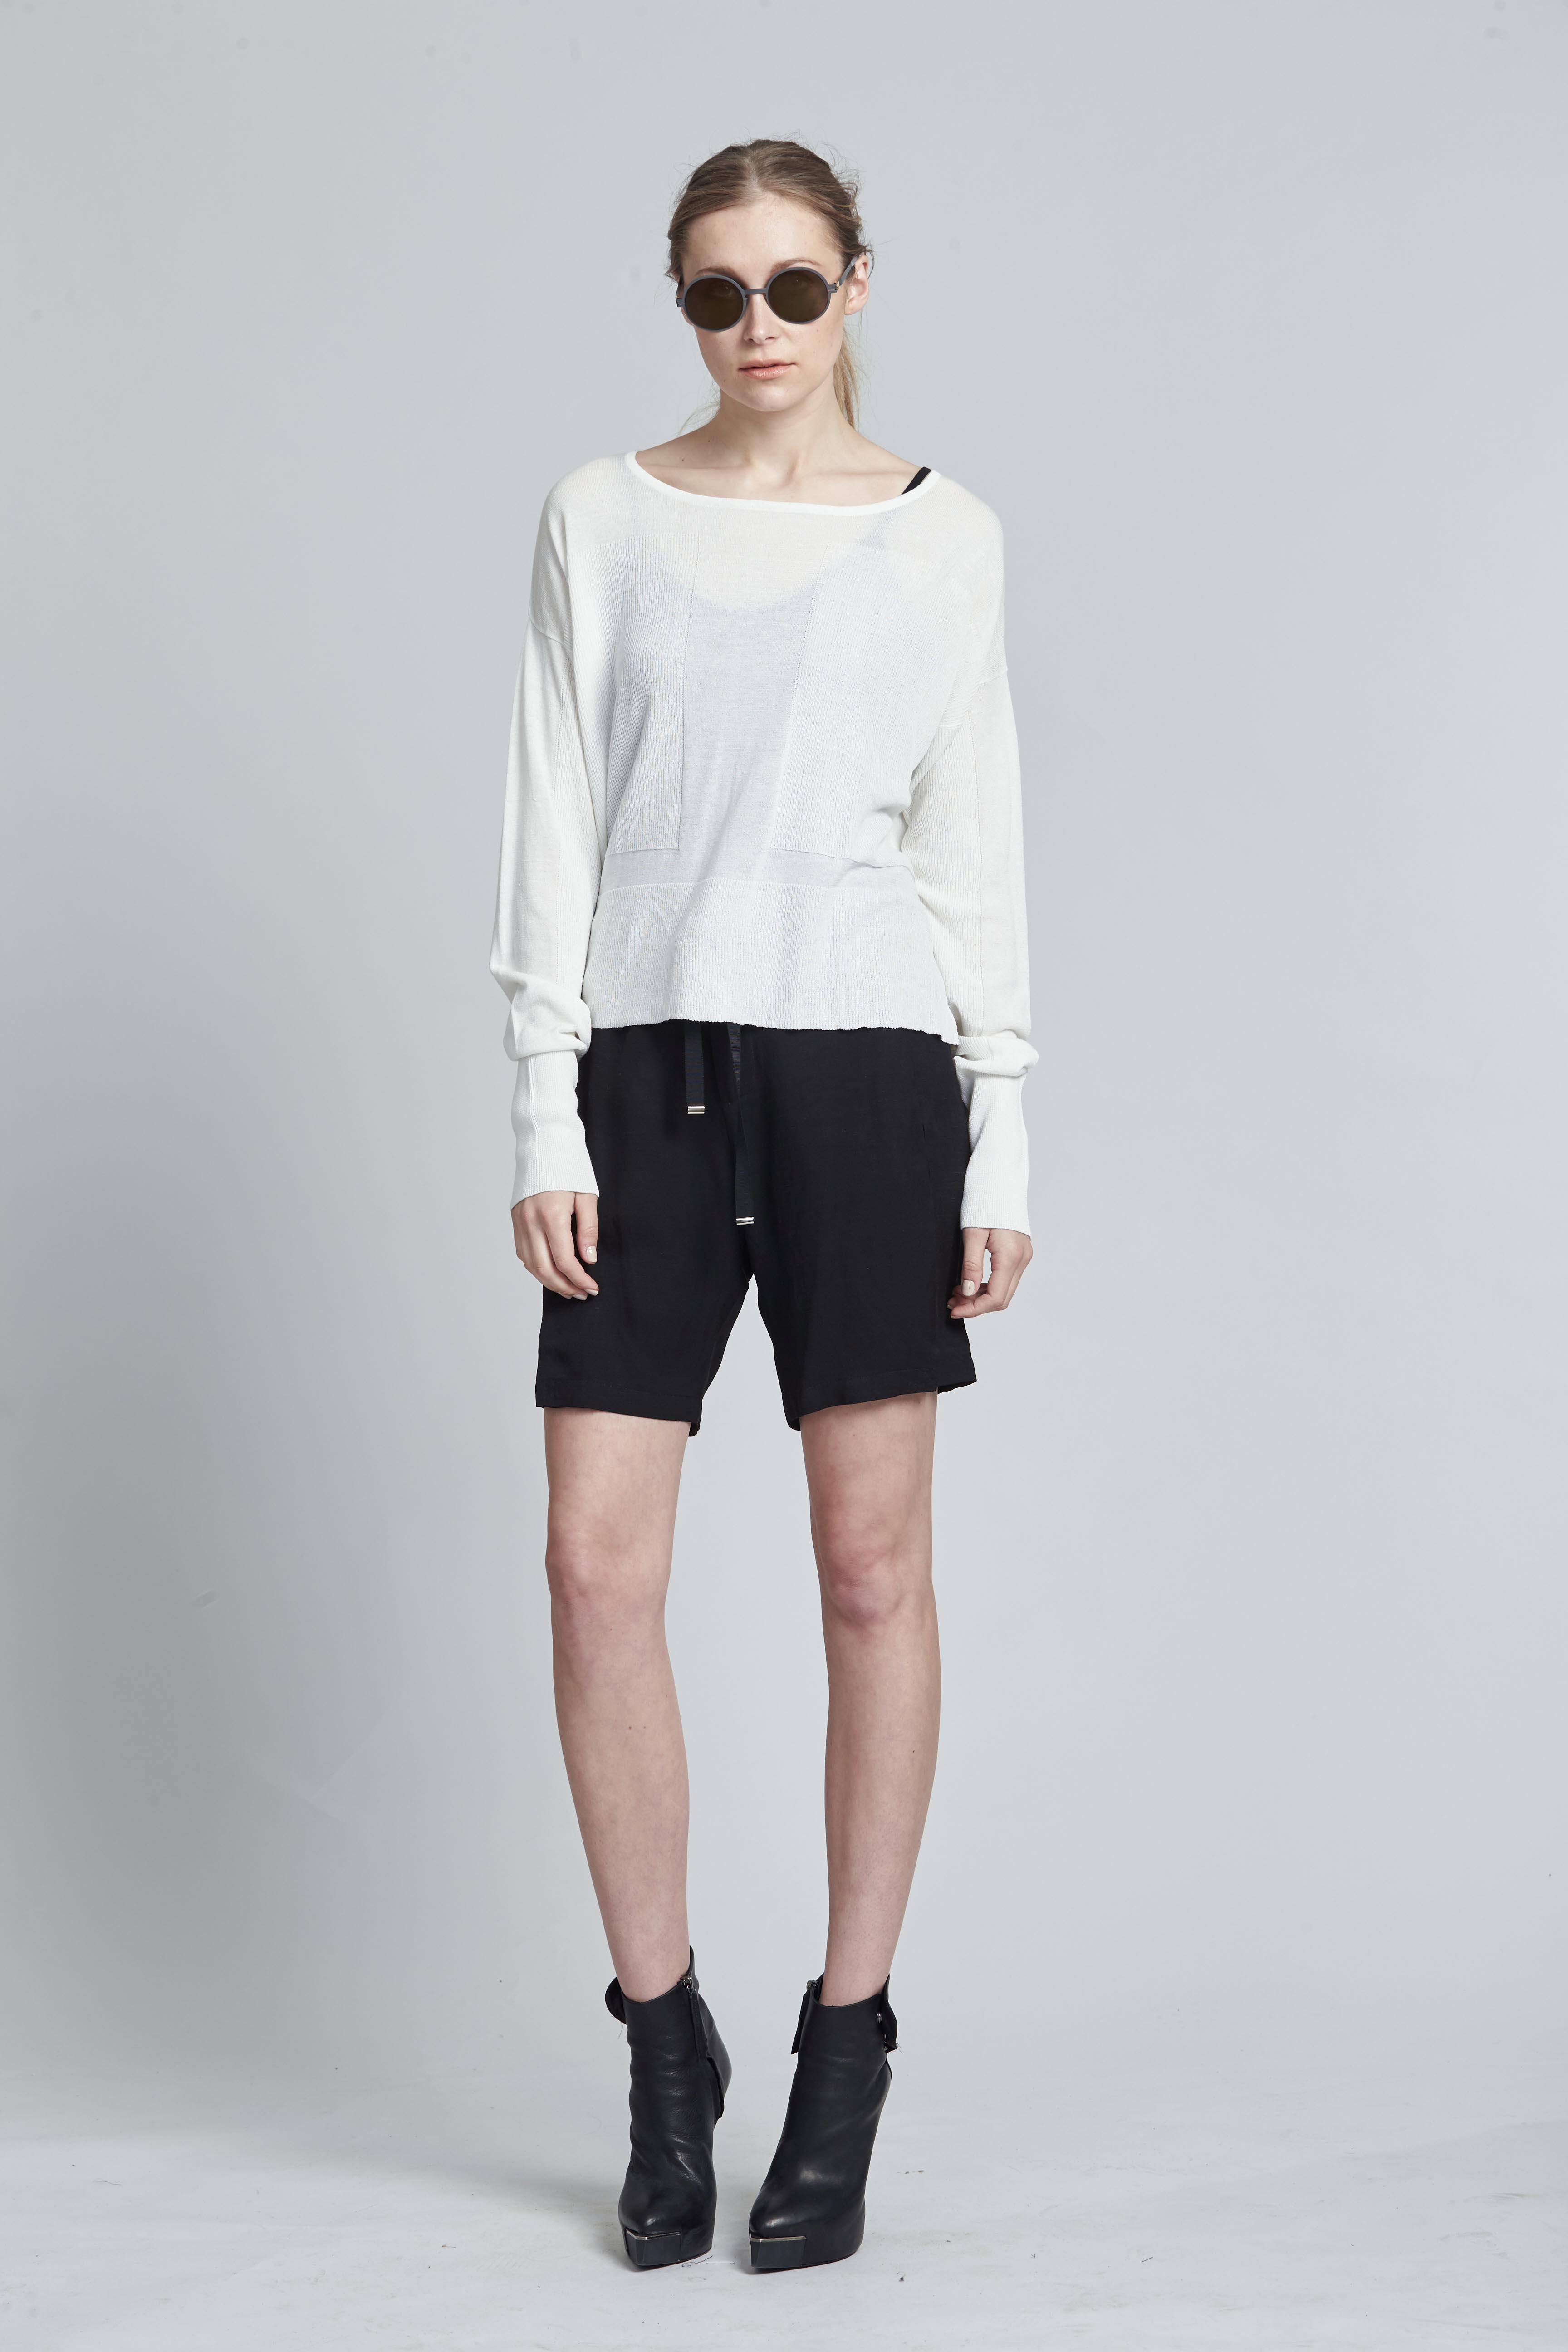 Associate Sweater Alabaster. Addition Shorts Black